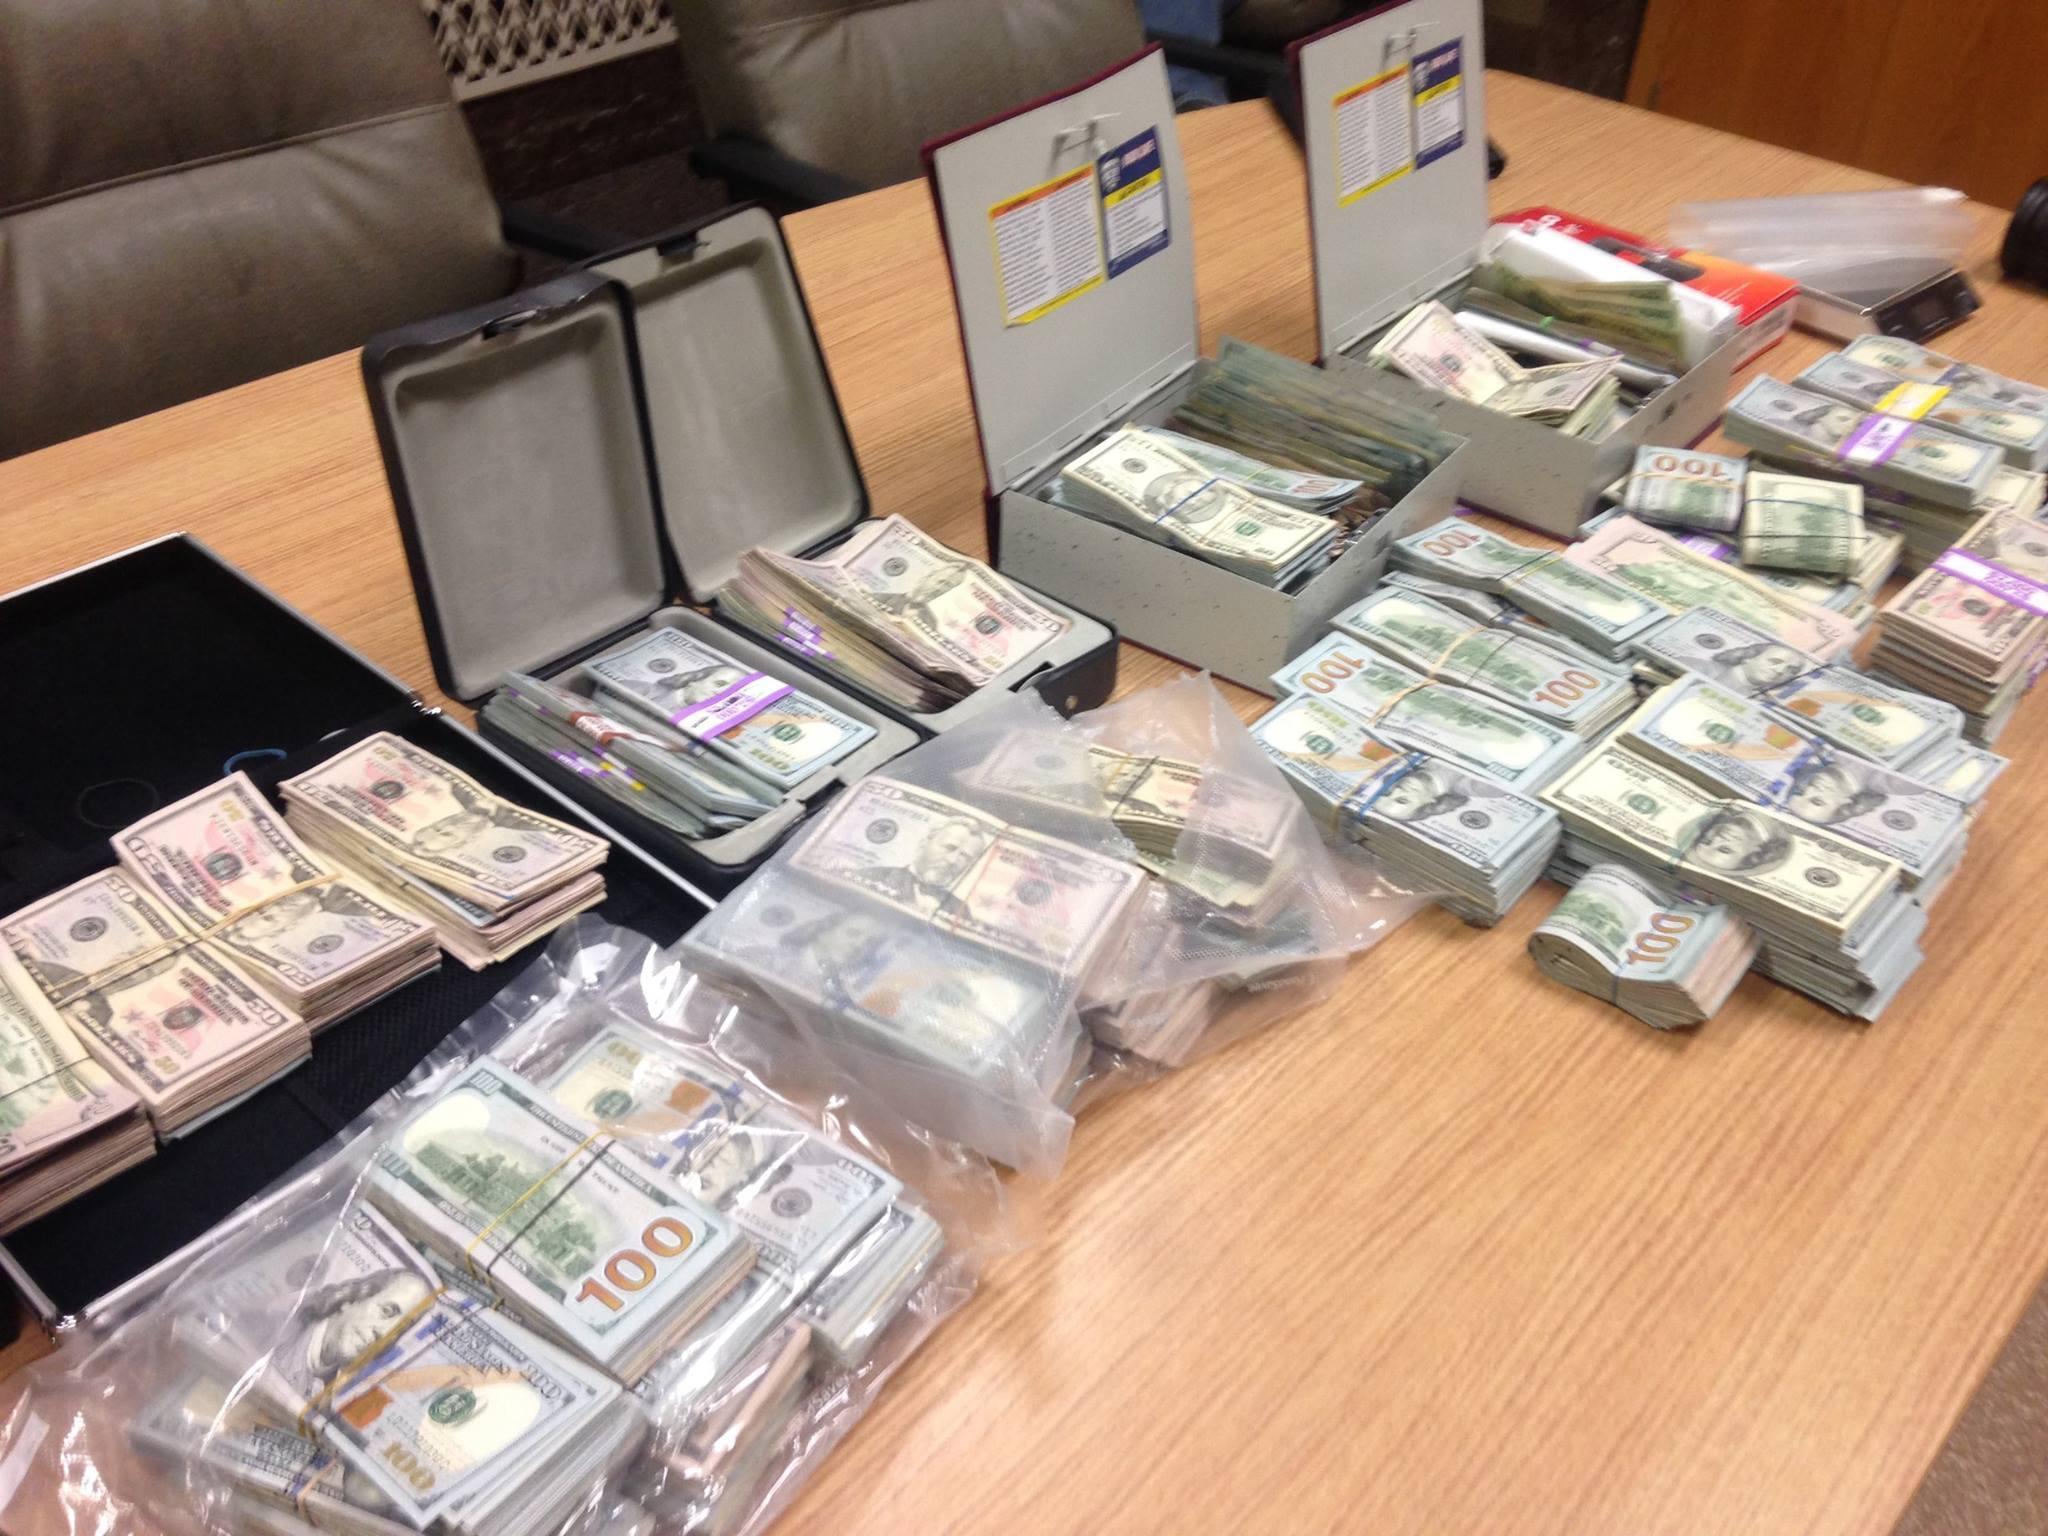 One man charged in $700K, 40-pound marijuana seizure | WBFO